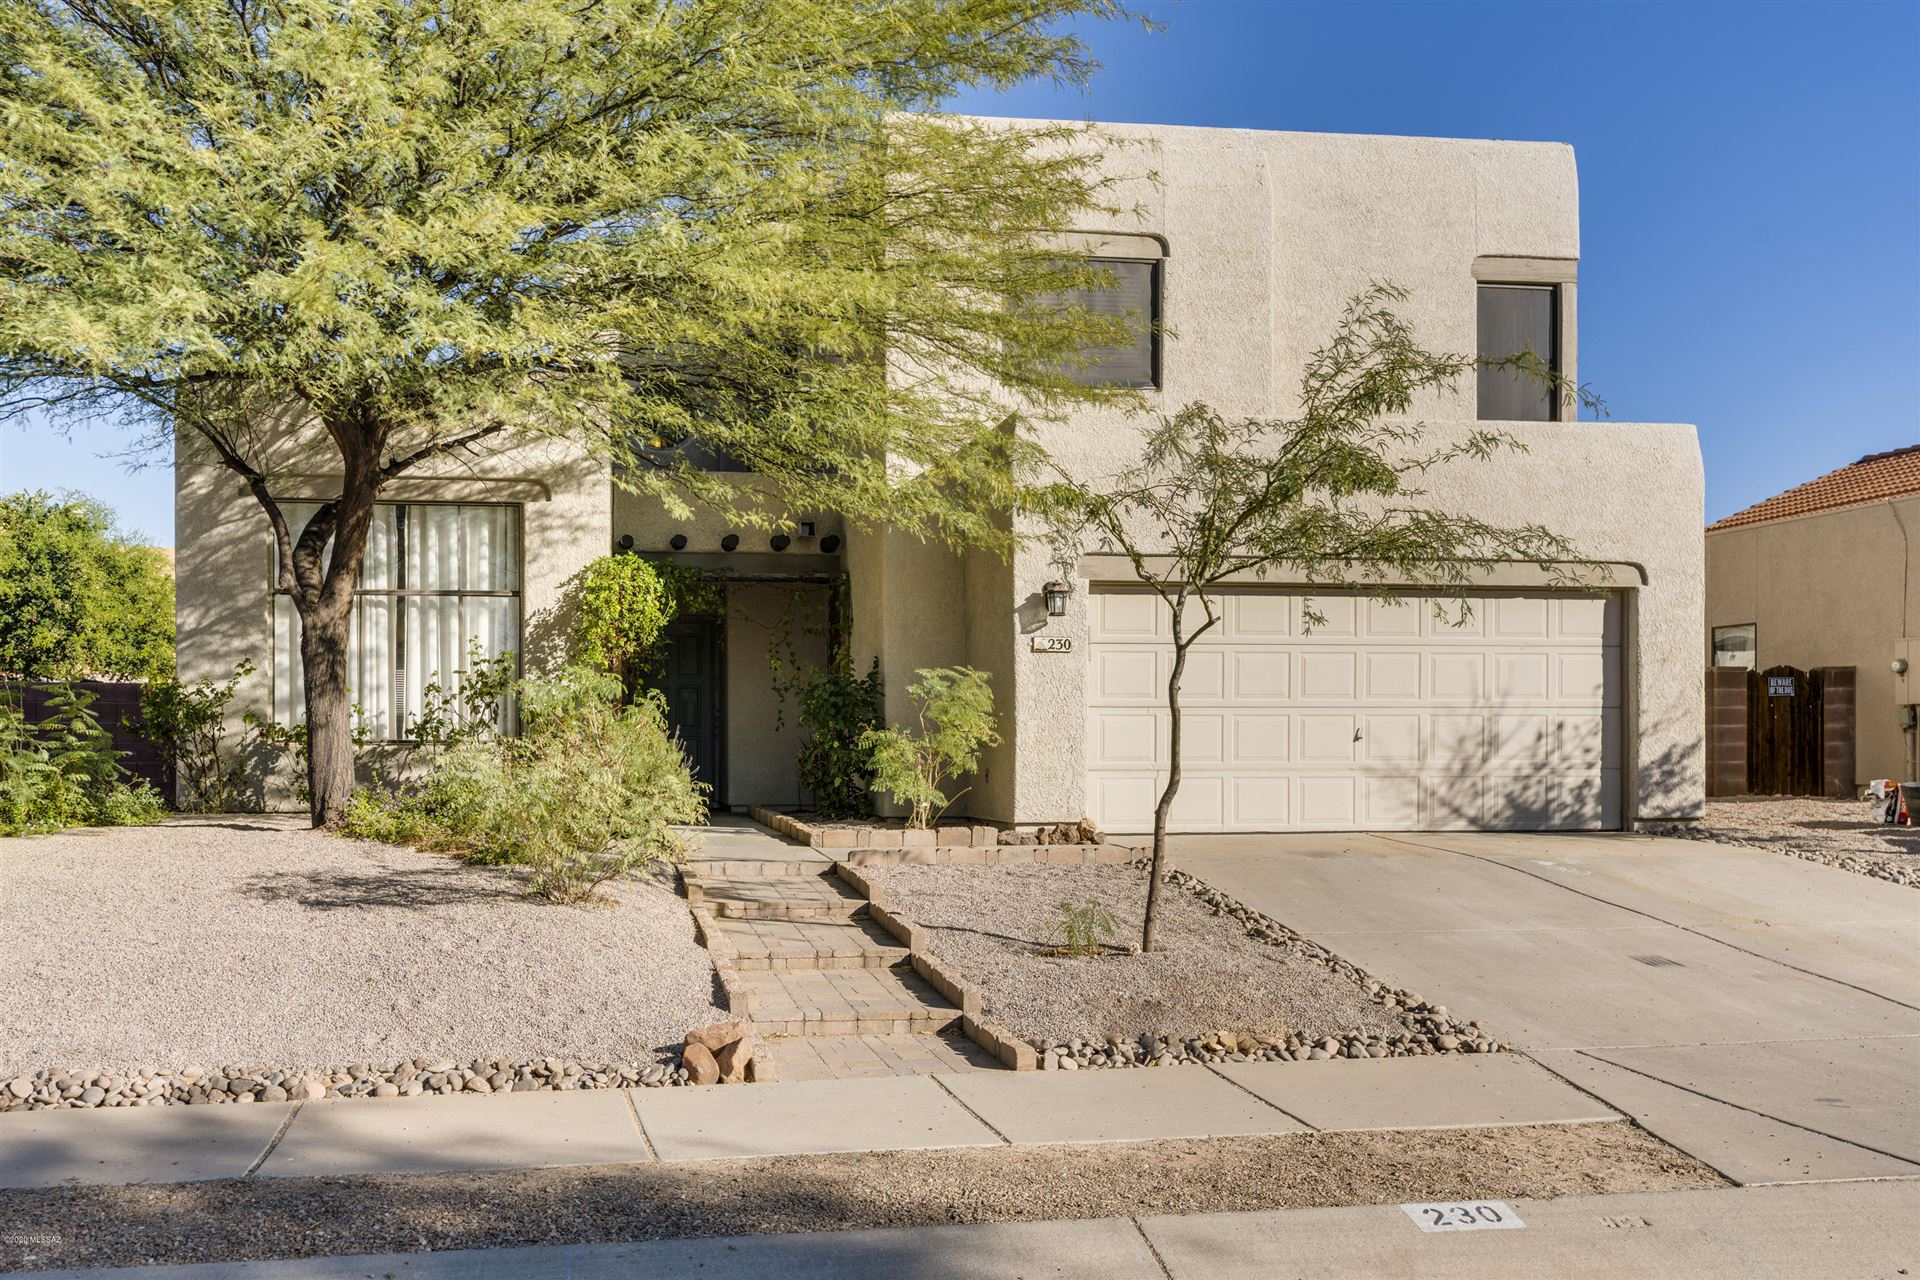 230 N Elster Drive, Tucson, AZ 85710 - MLS#: 22029689